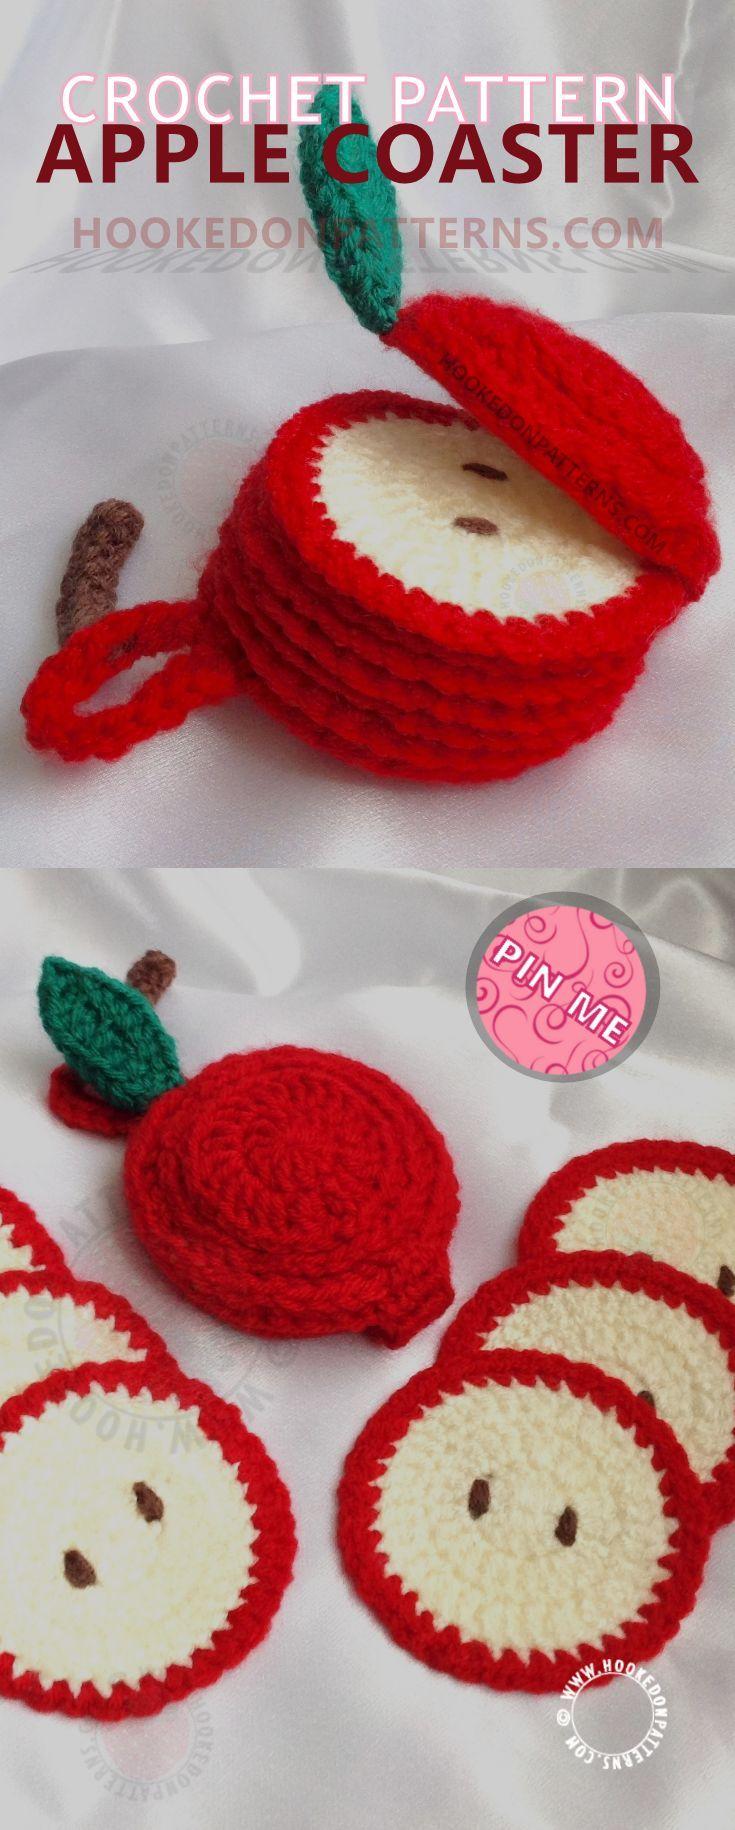 Apple Coaster Crochet Pattern - Crochet this coaster set - crochet fruit tableware - apple crochet pattern